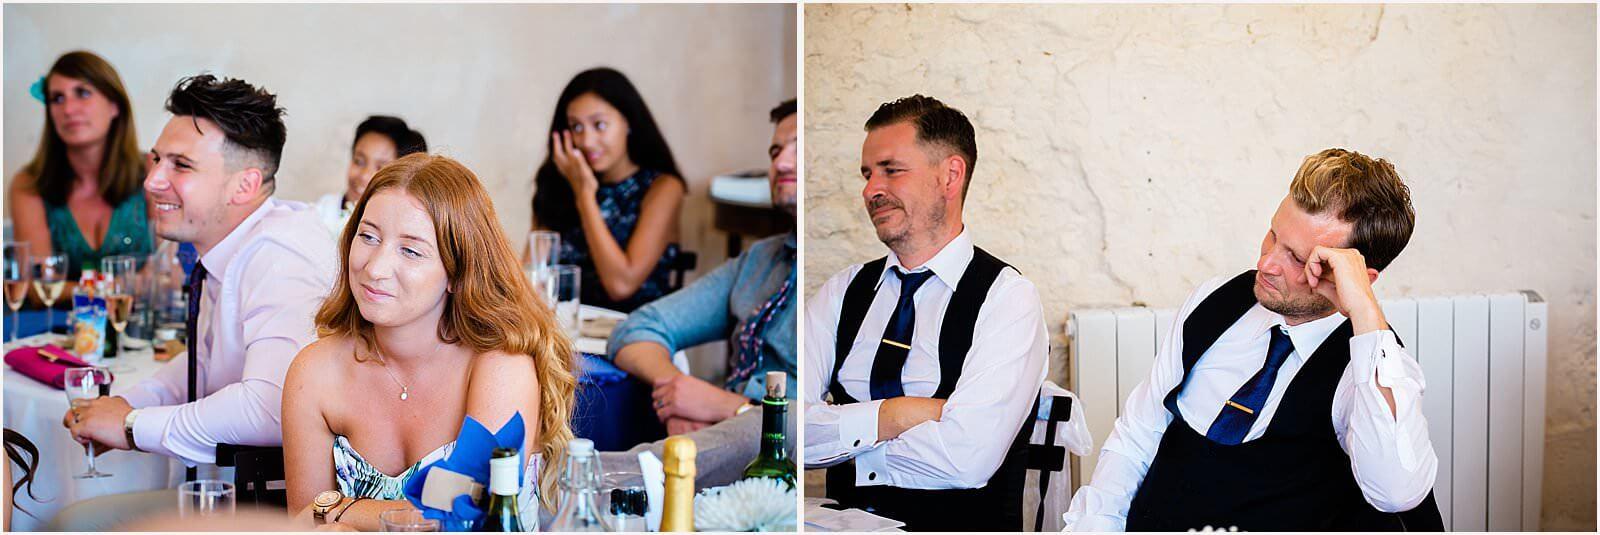 Chateau de Courtomer Wedding | Chantel & Evan 45